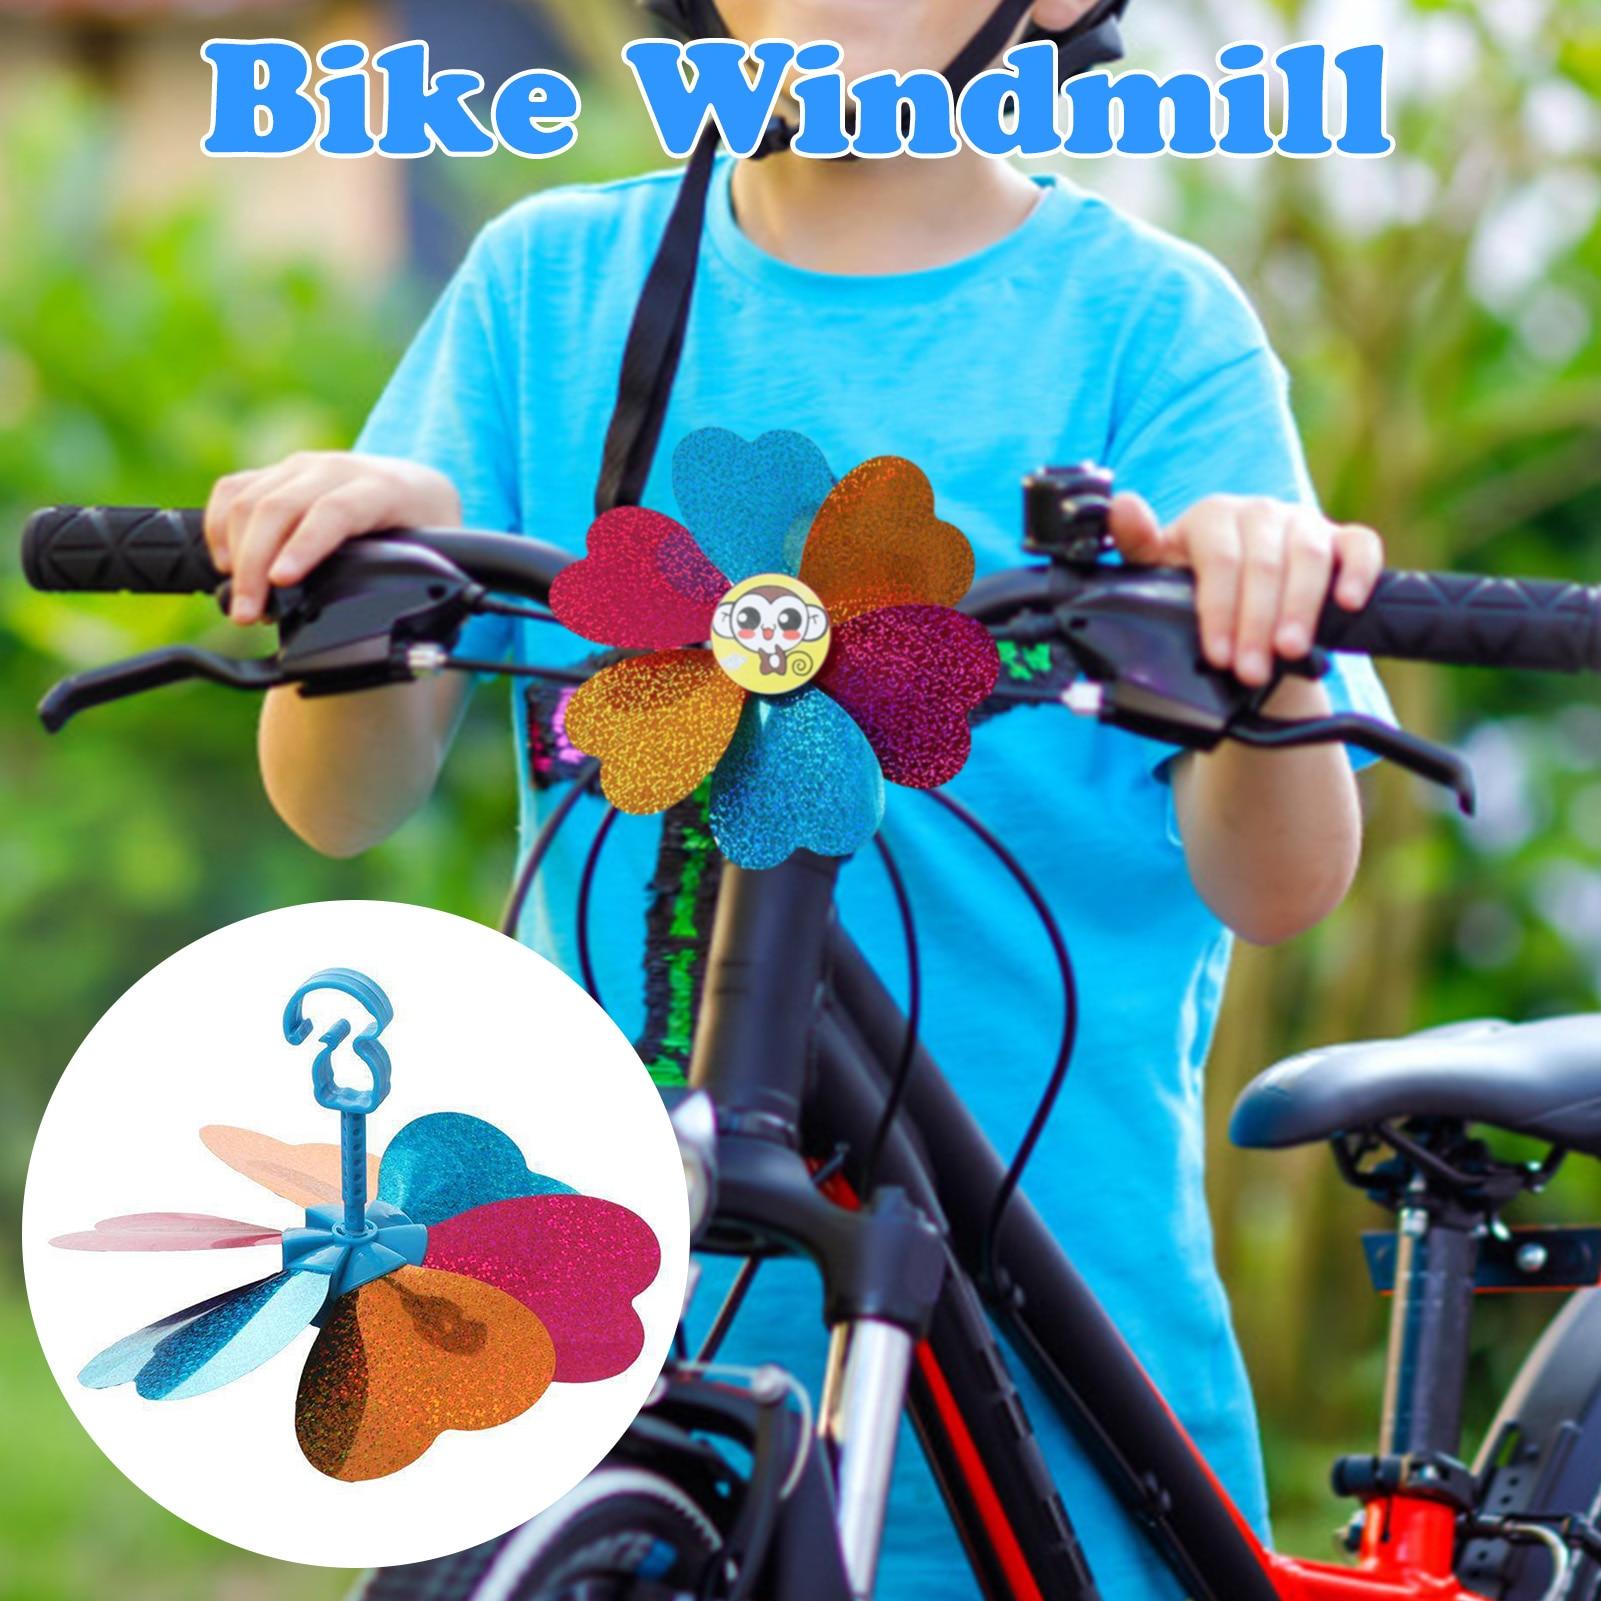 Bike Windmill Cartoon Colorful Plastic Handlebar Pinwheel Childrens Scooter Breaststroke Bike Windmill Accessories New